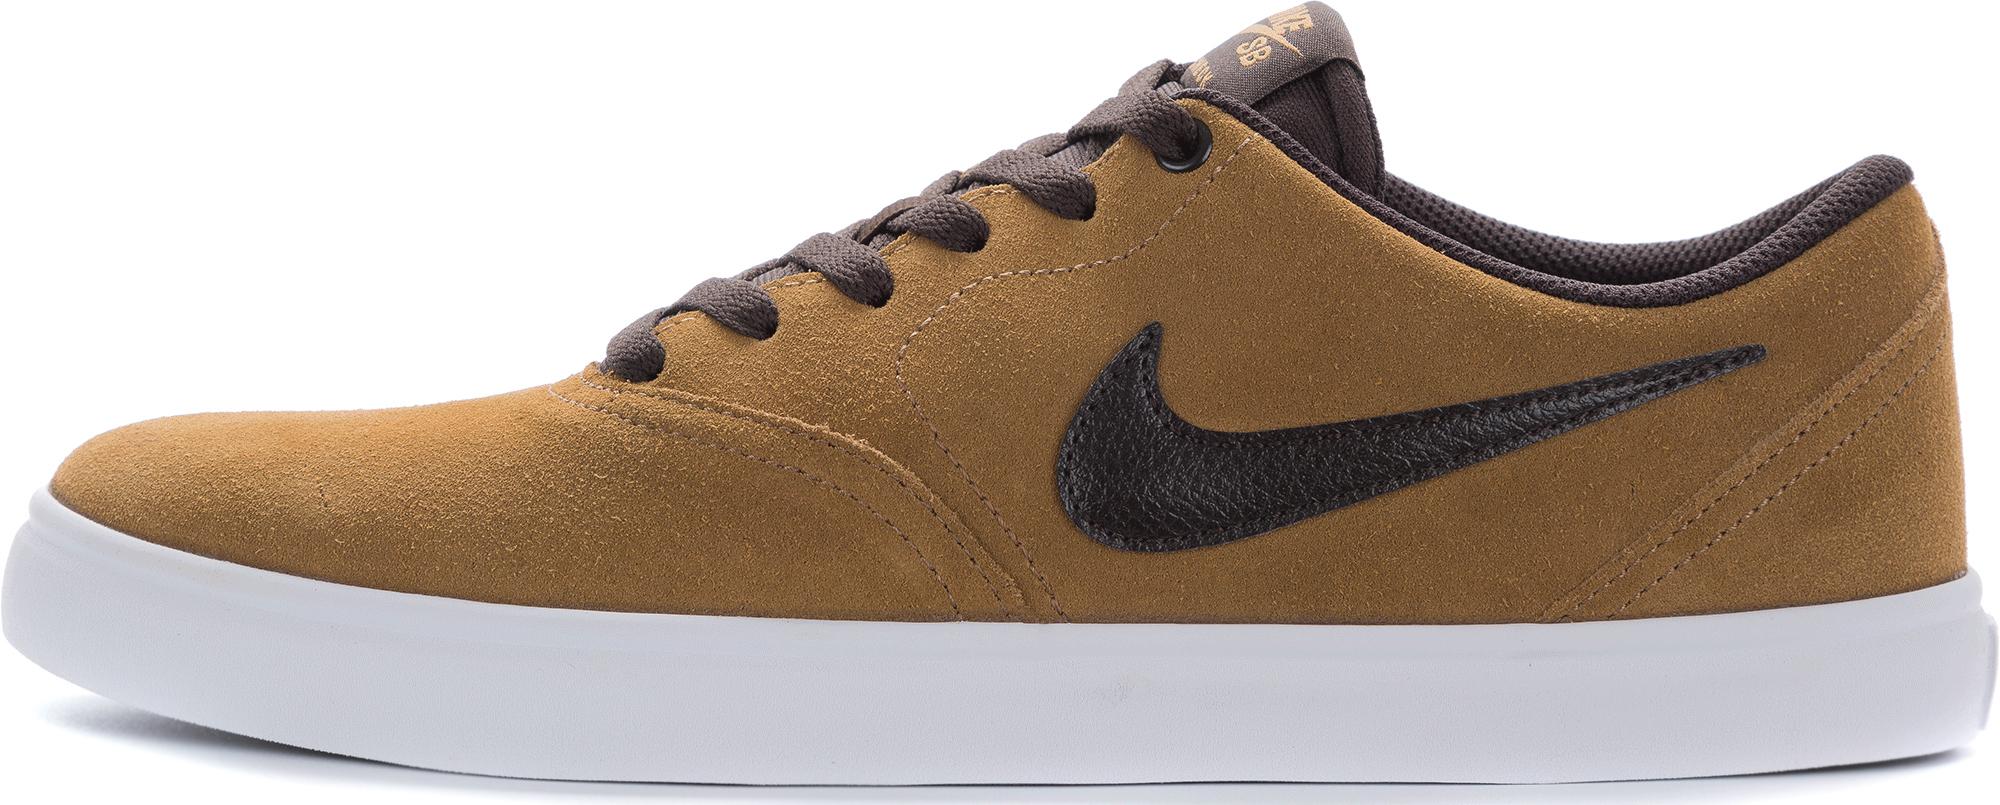 Nike Кеды мужские Nike SB Check Solarsoft, размер 44